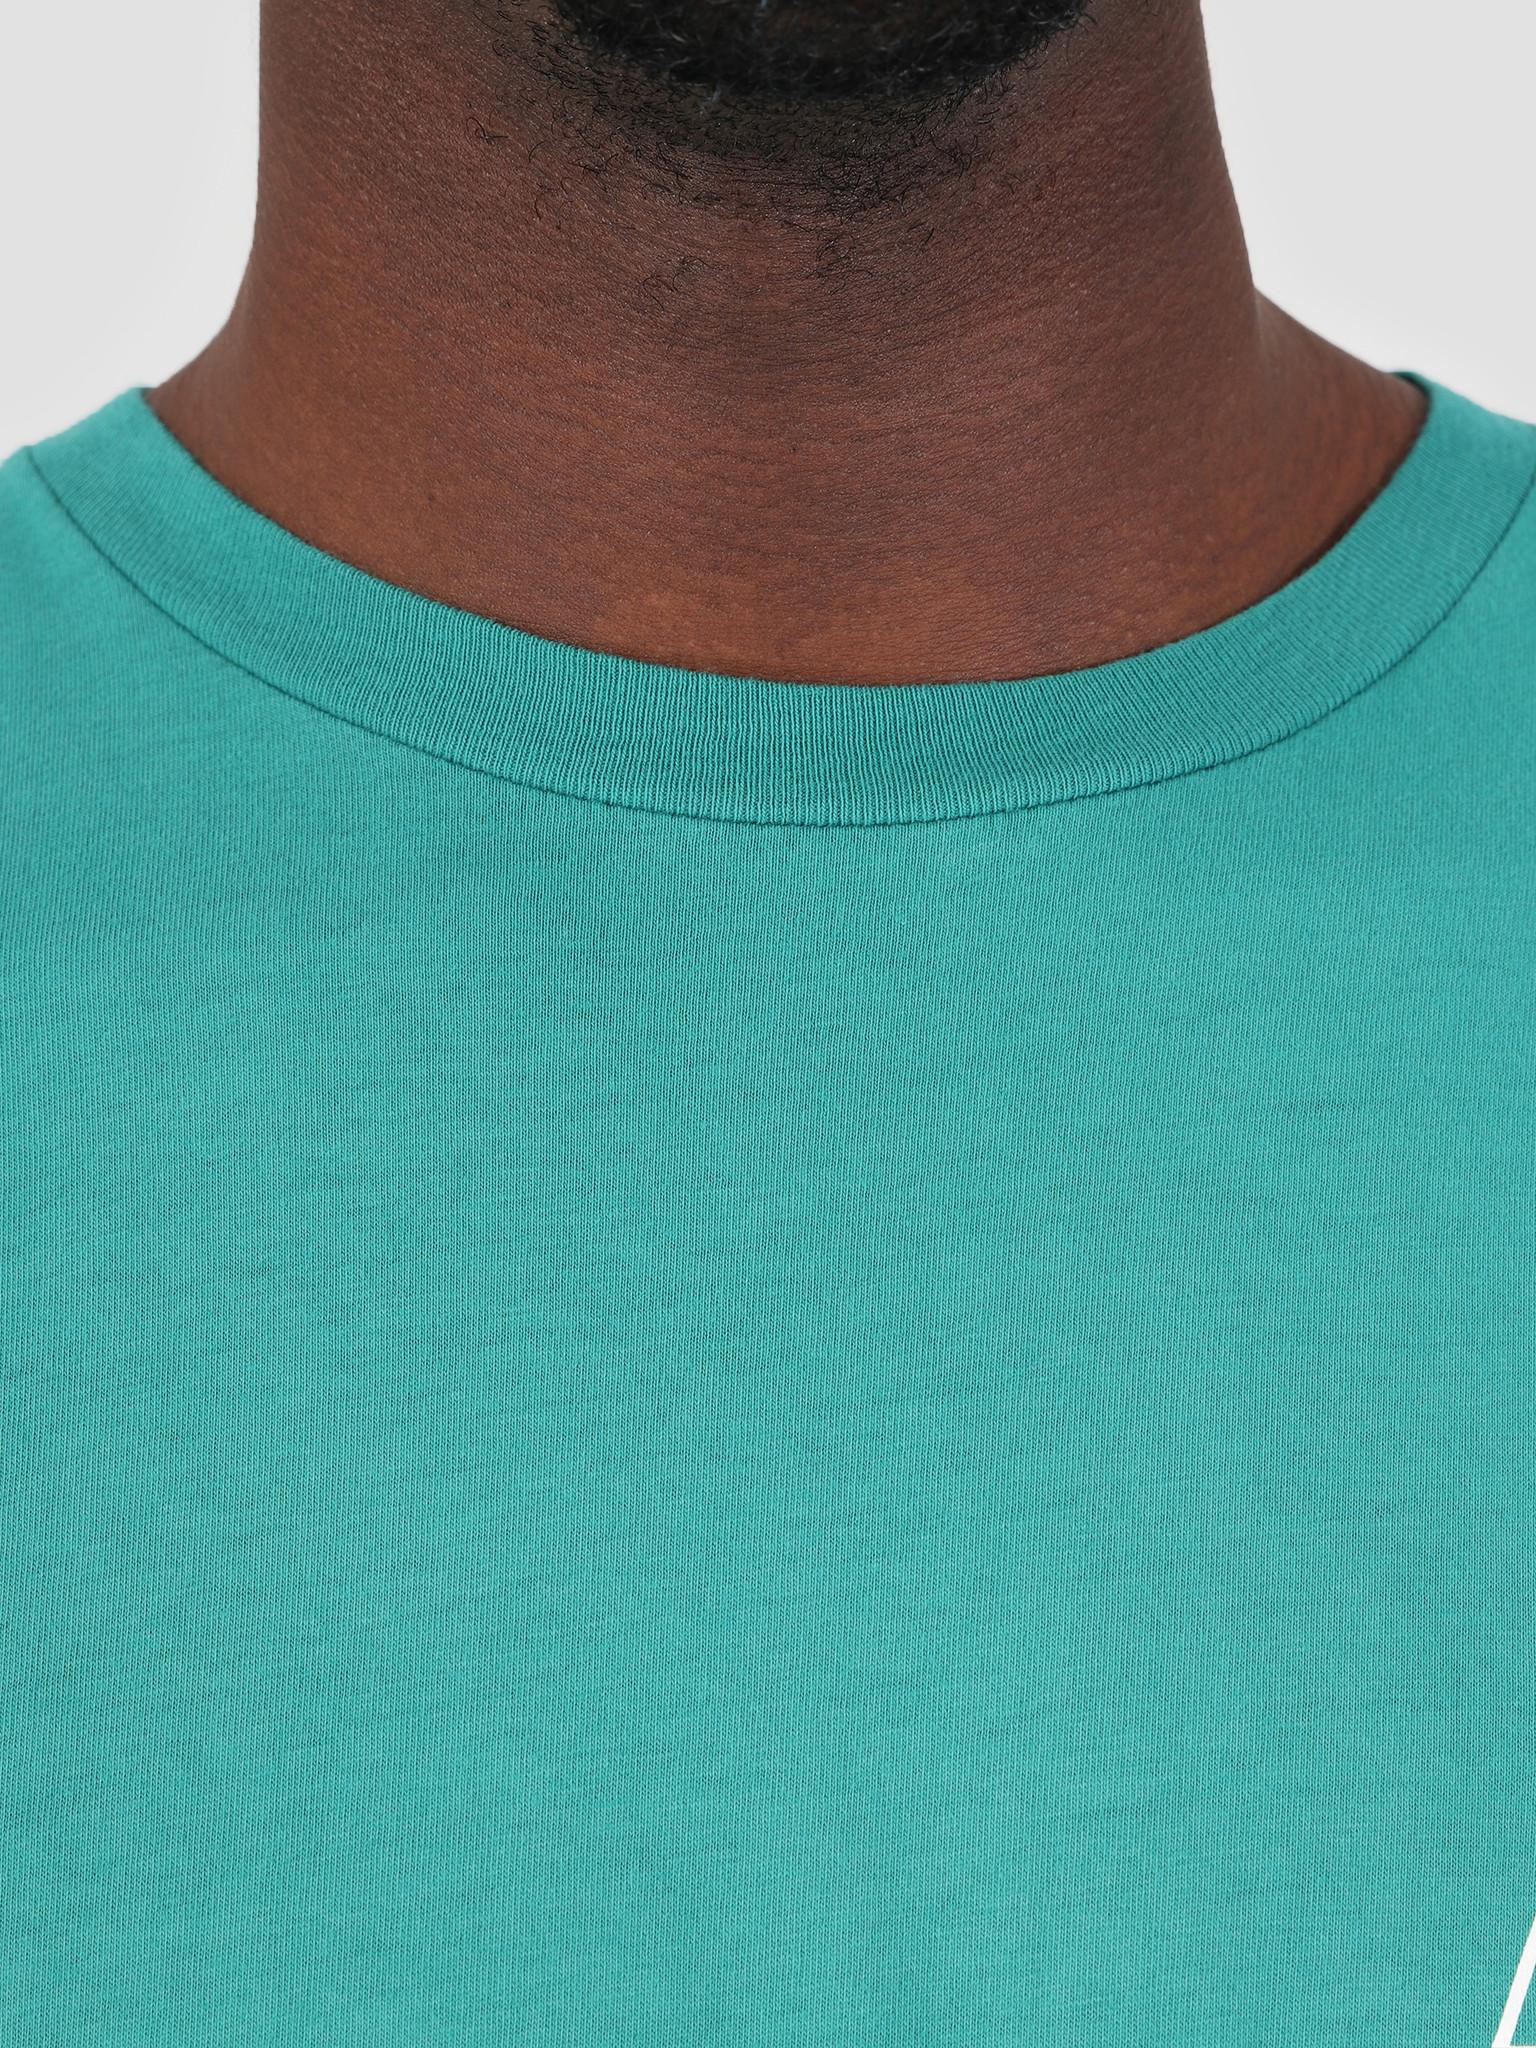 HUF HUF City Rose TT T-Shirt Deep Jungle TS00574